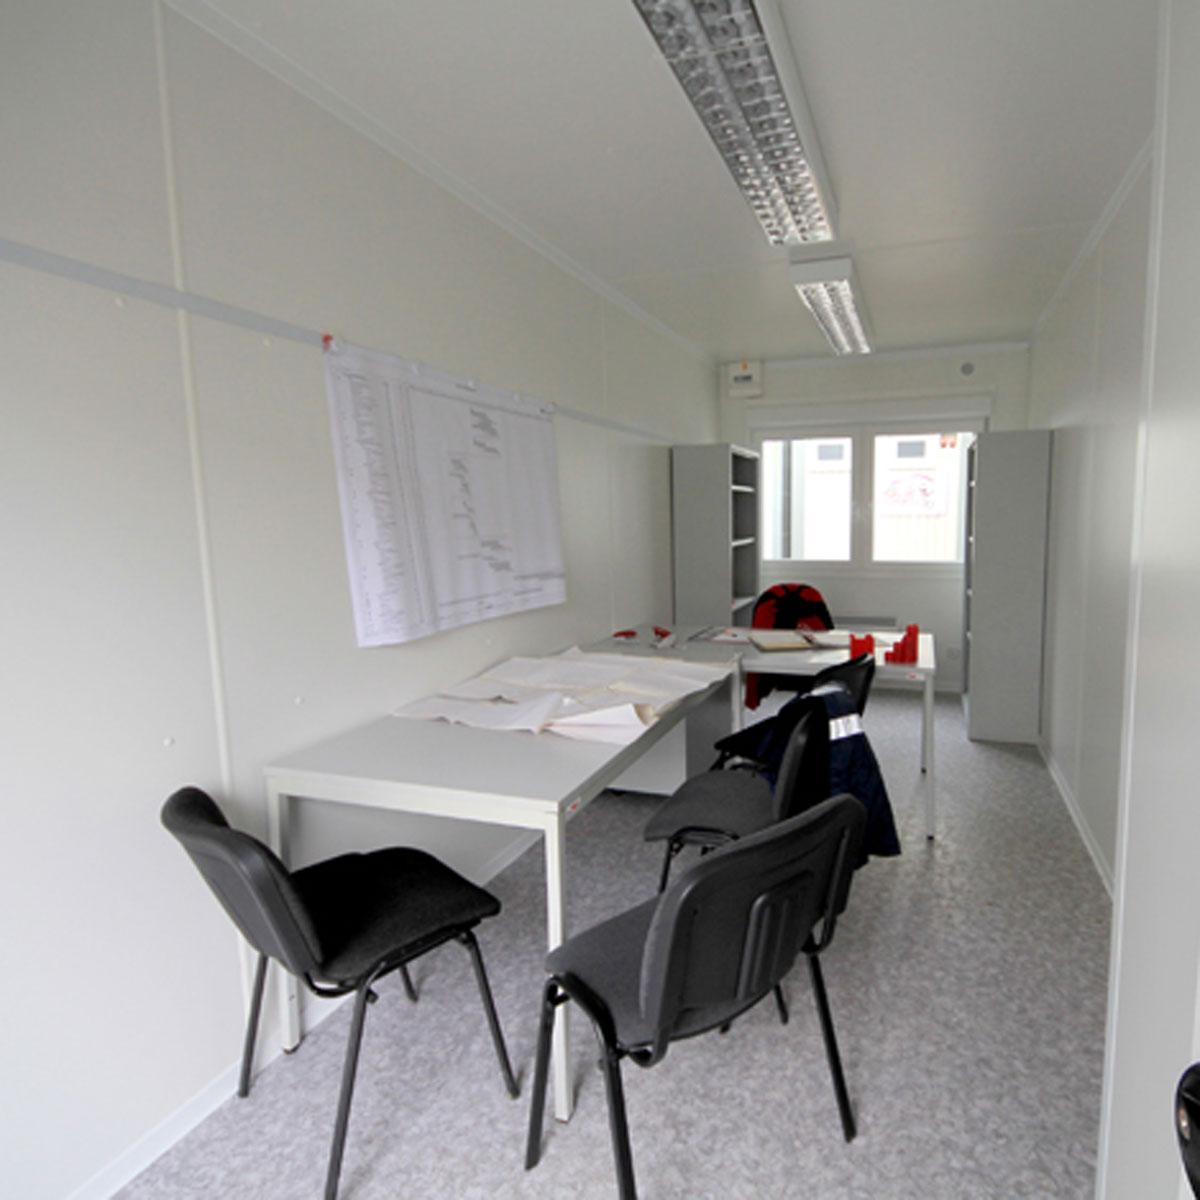 Polster Stapelstuhl, Konferenzstuhl, Besucherstuhl